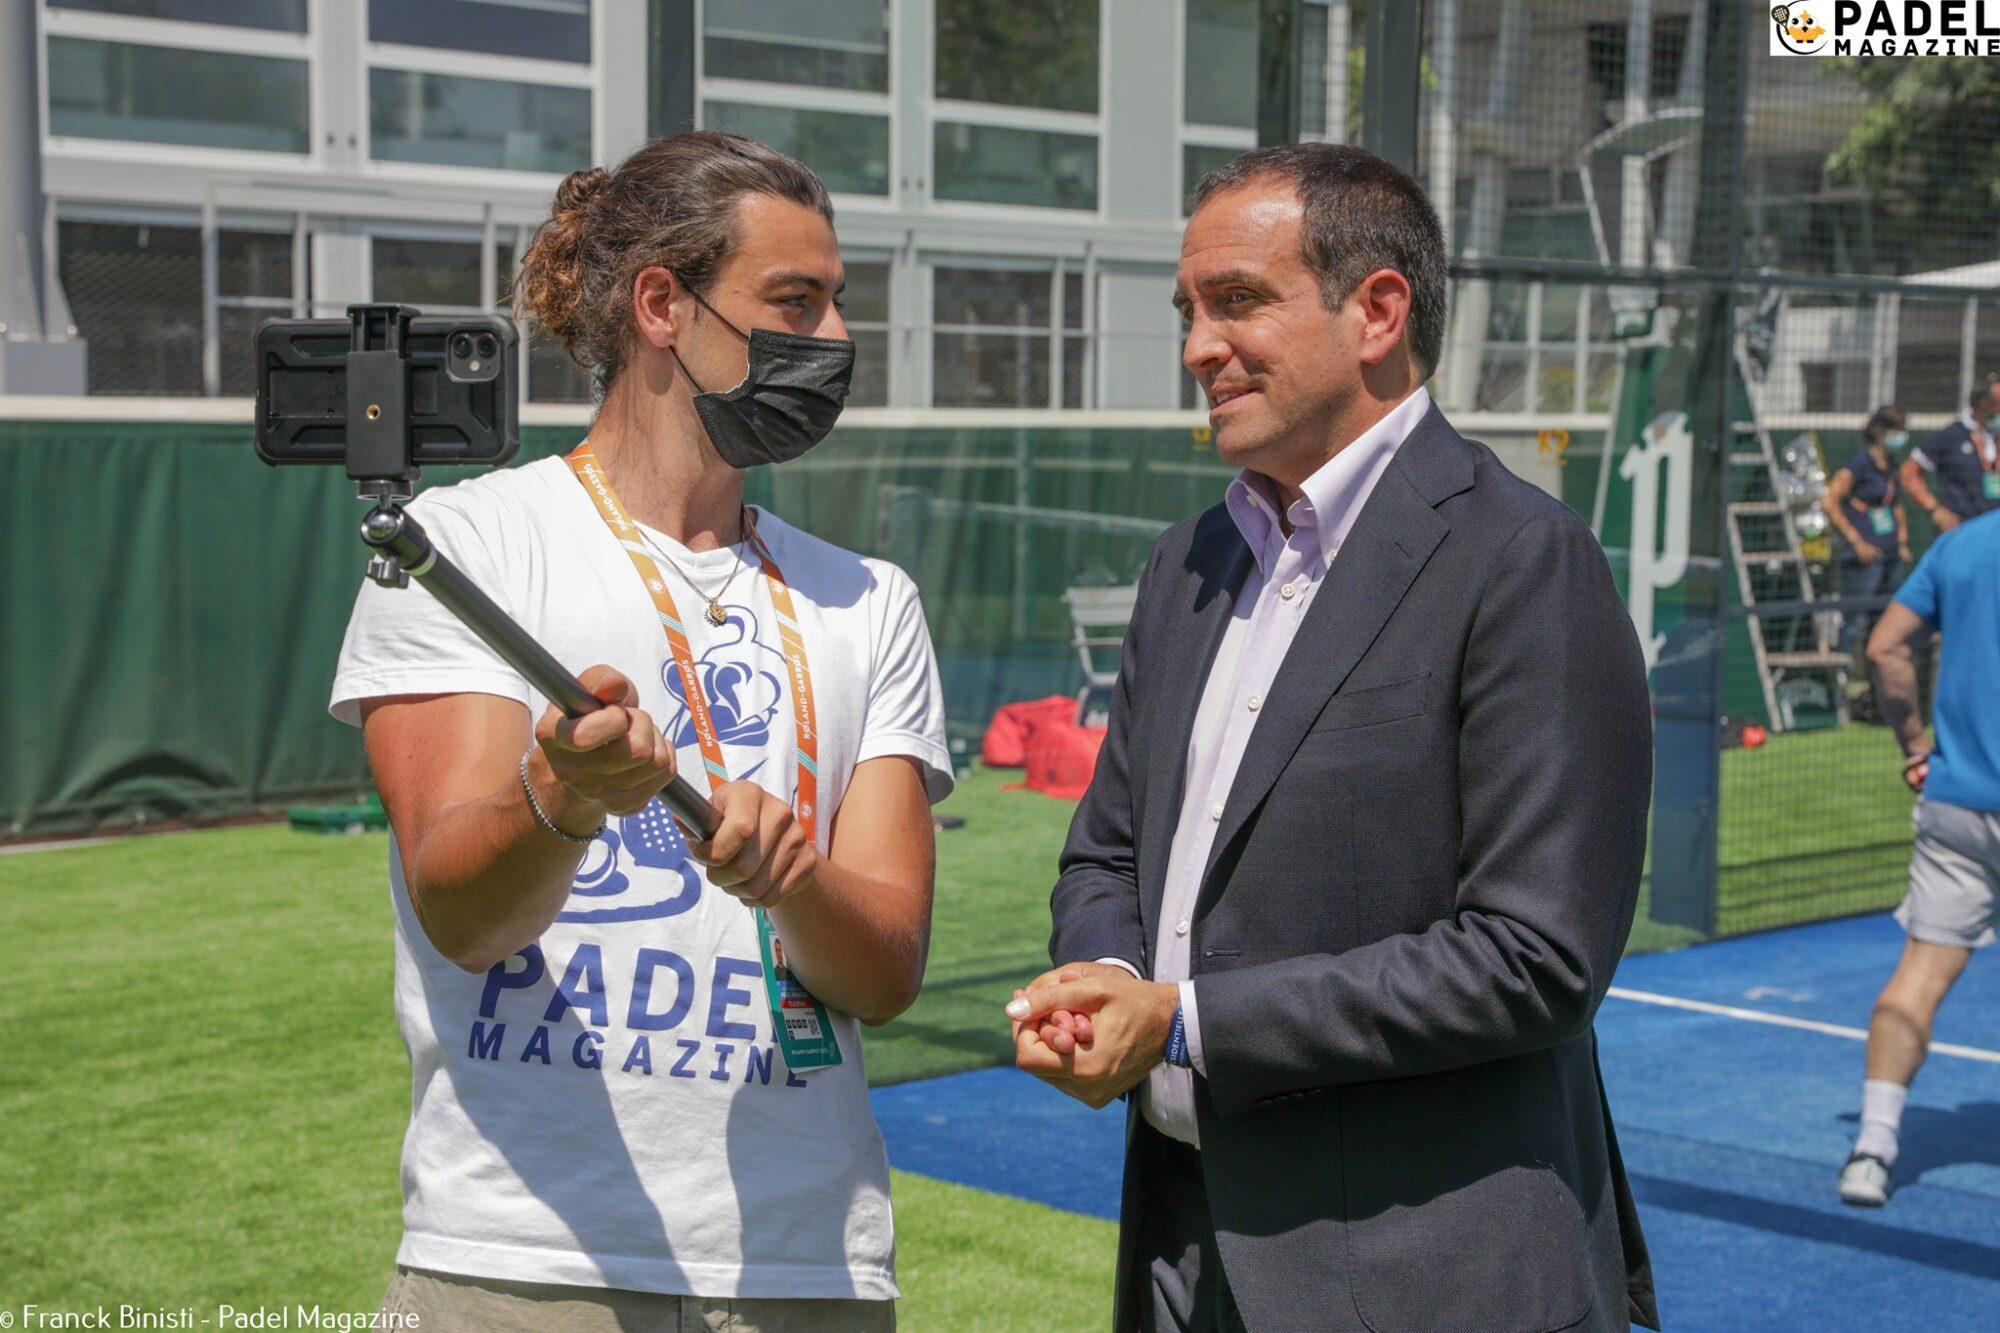 Lorenzo Lecci Luigi Carraro Padel Roland Garros interview